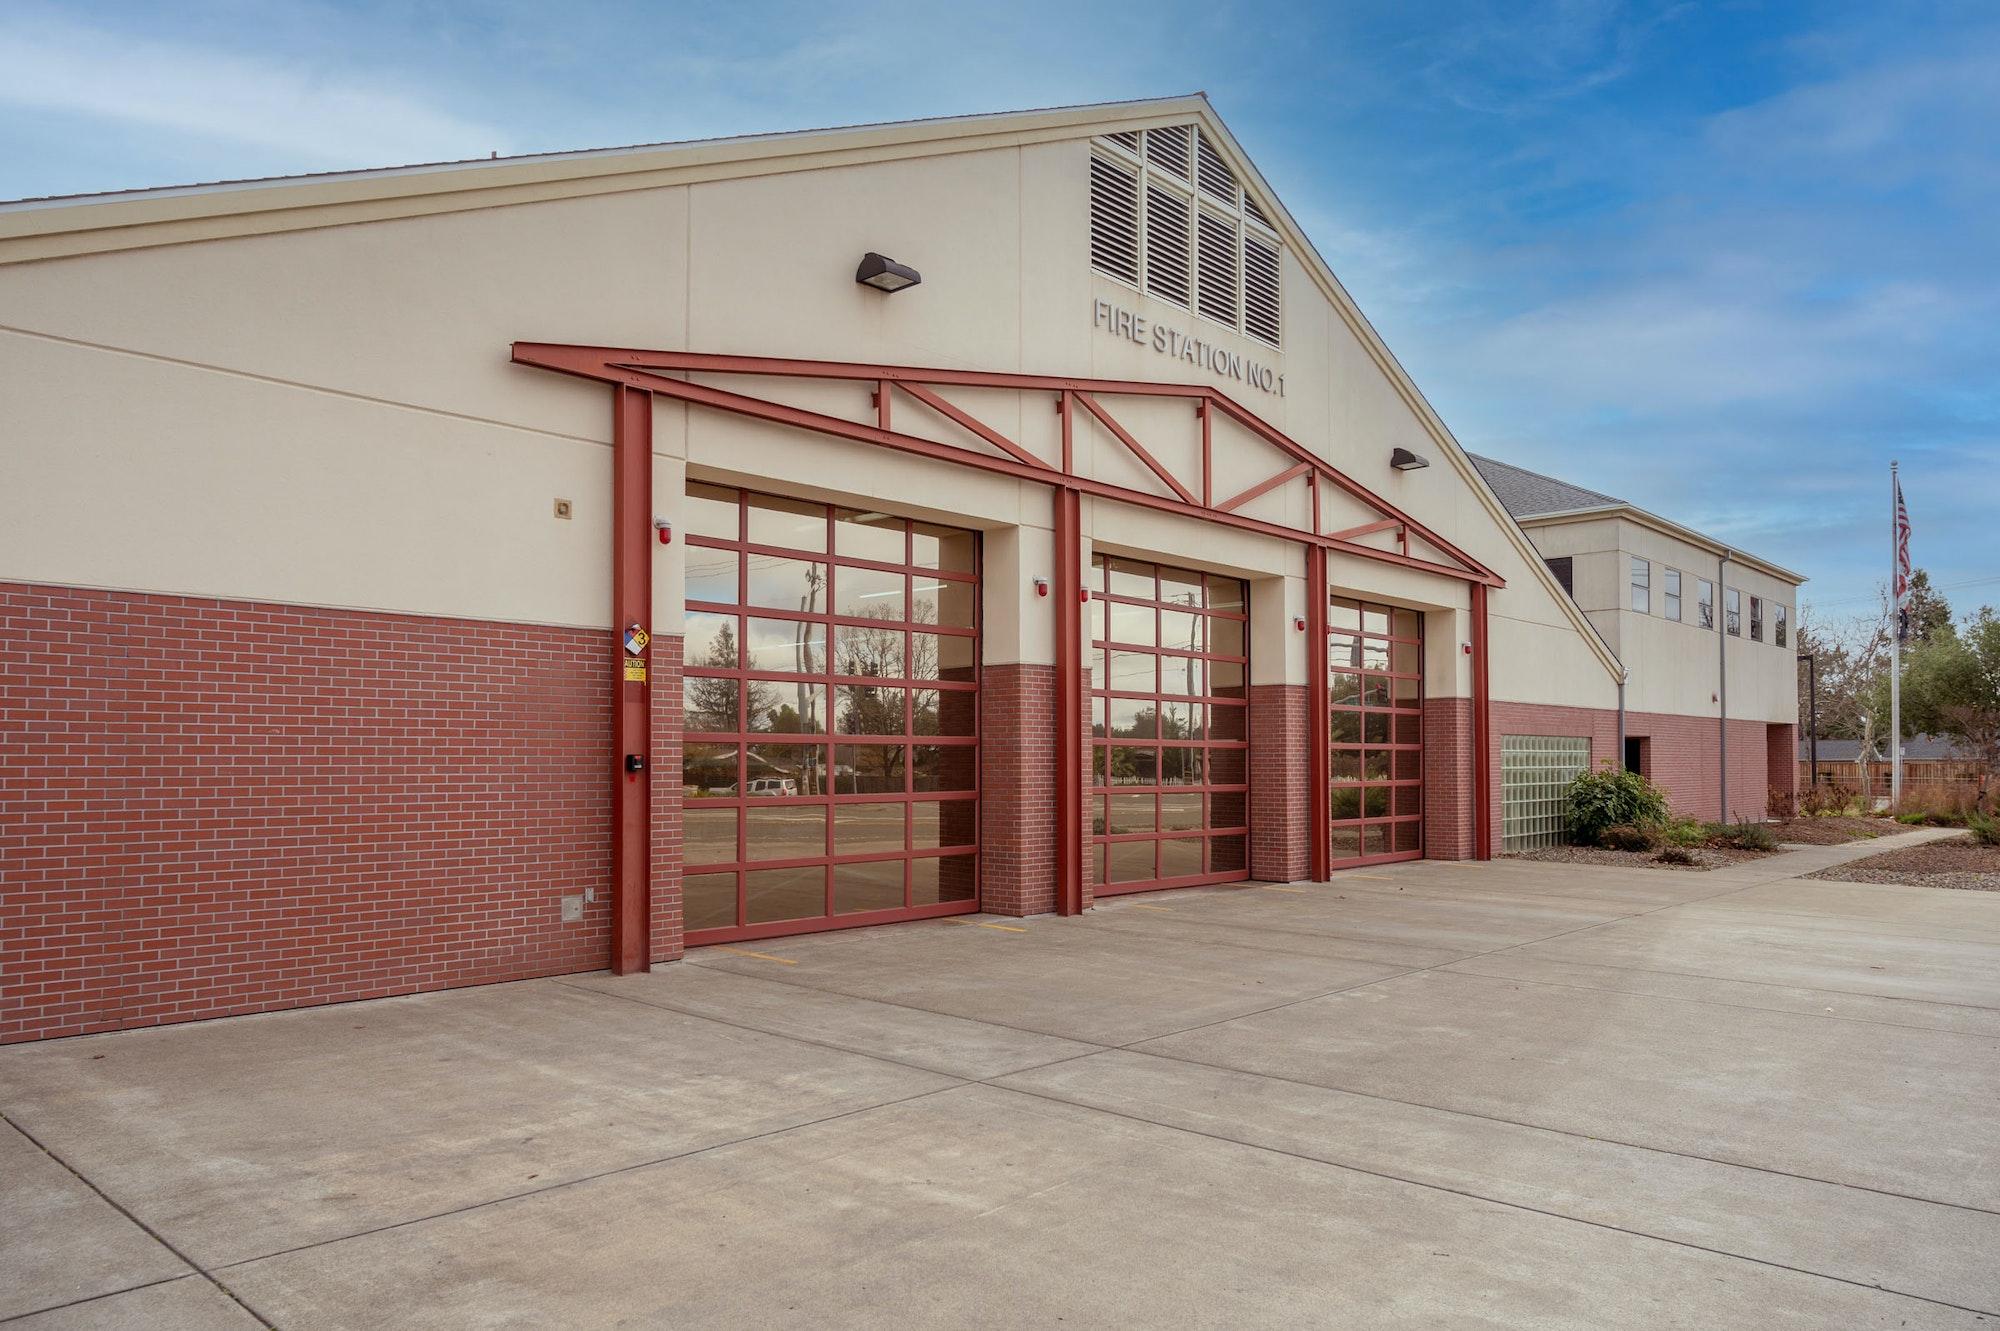 May contain: hangar and building